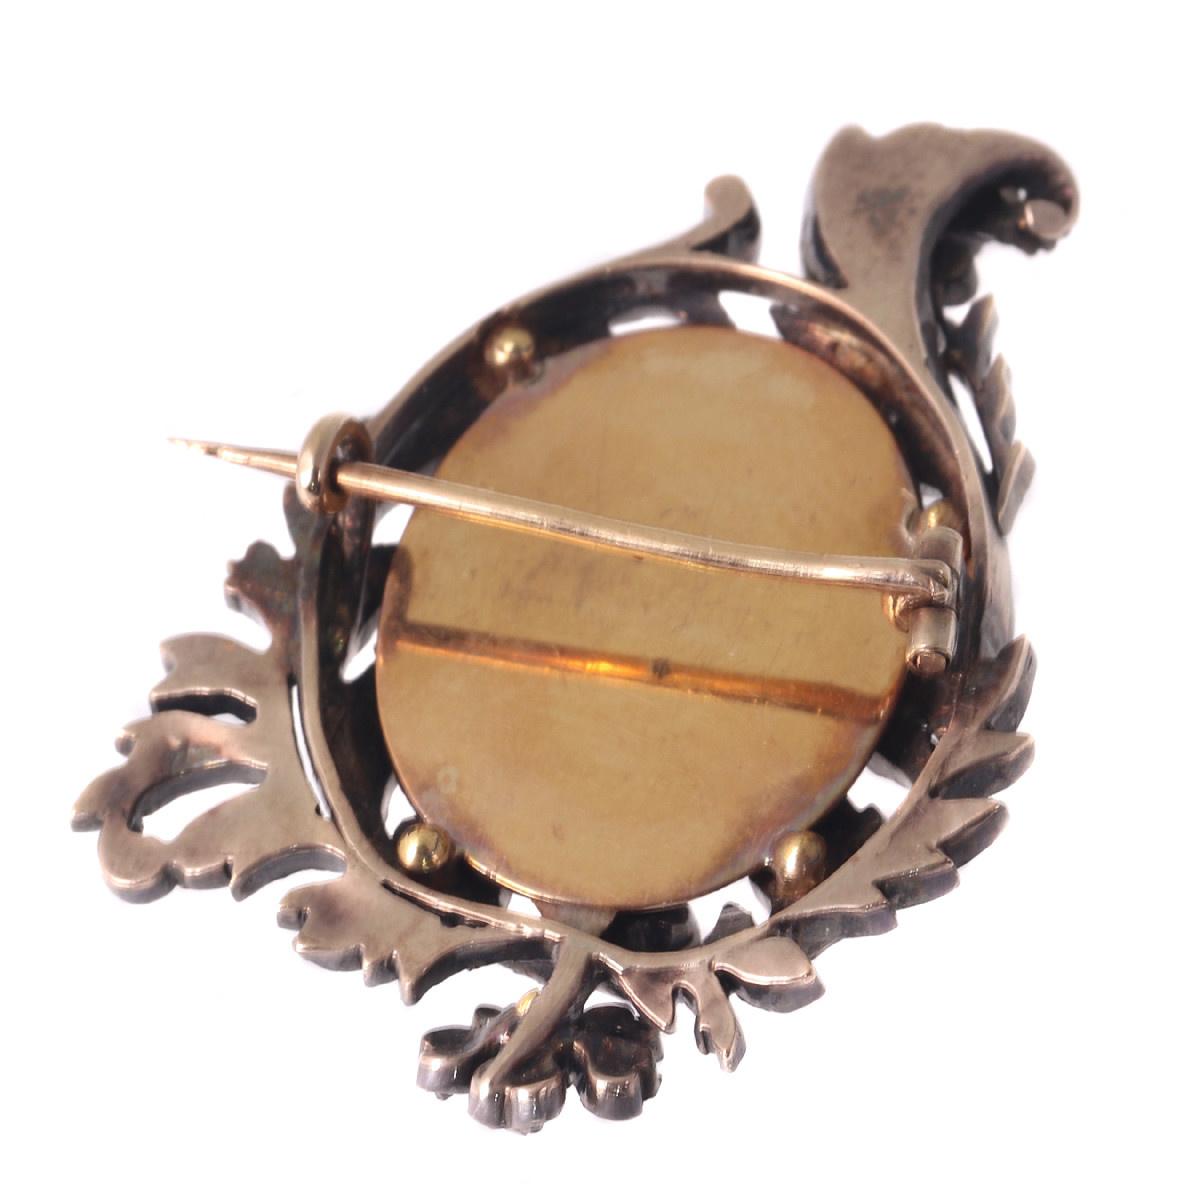 x Brass and Copper Intricate Asymmetrical Edwardian Oval Flower Brooch #2